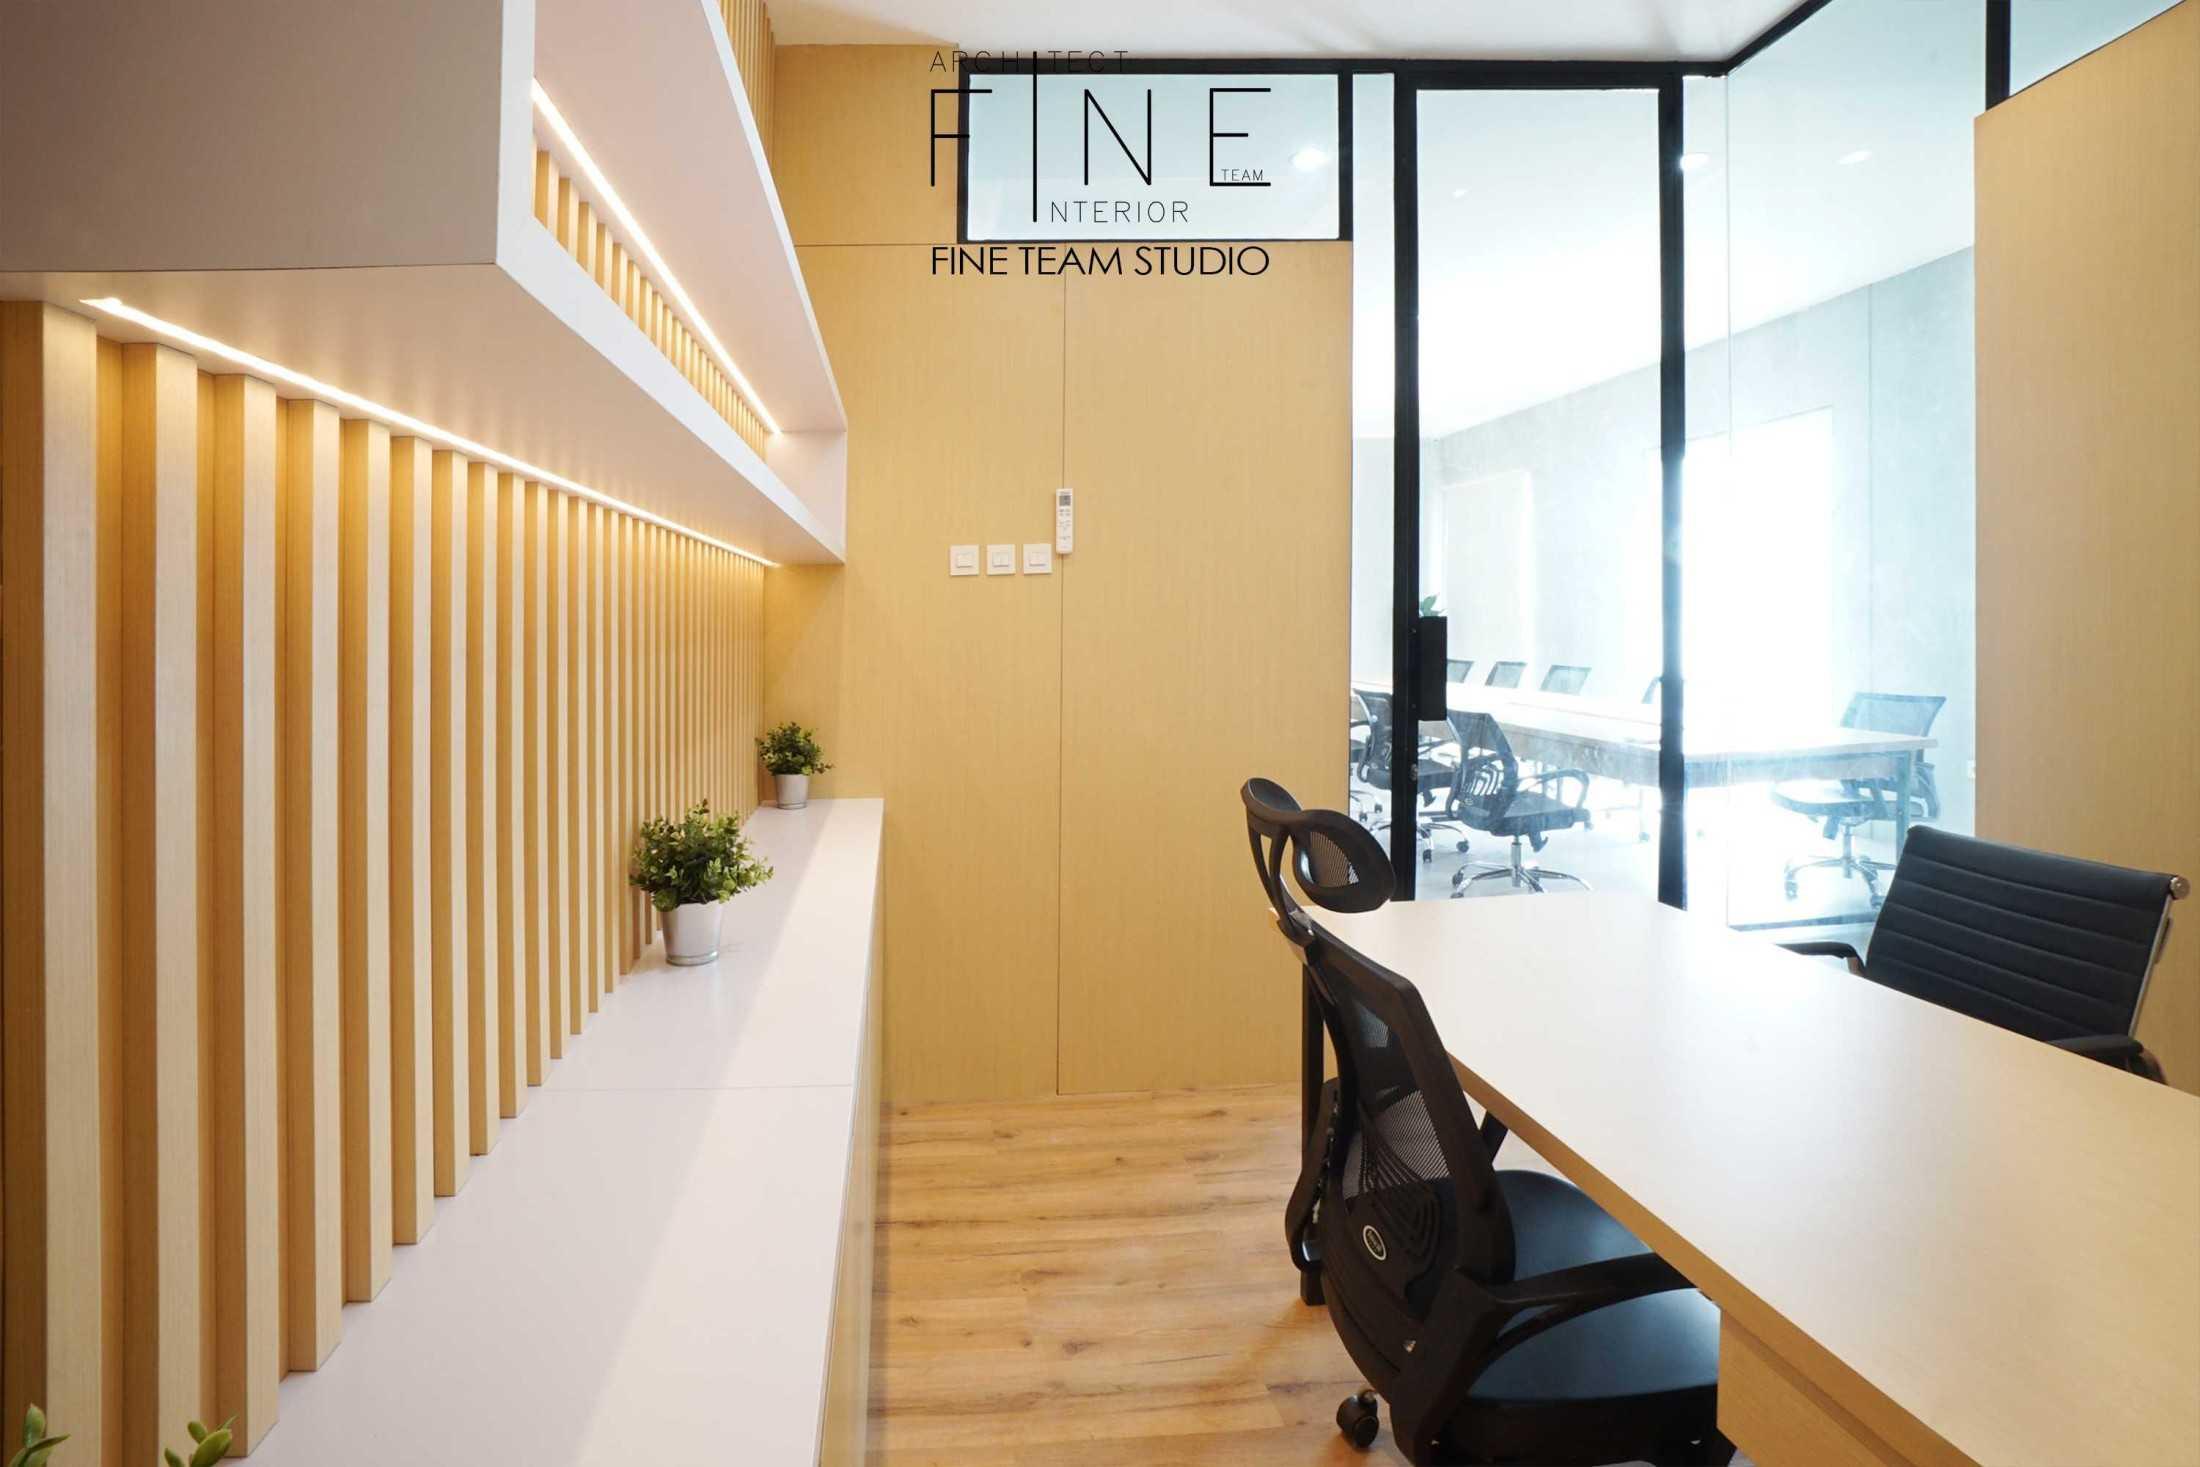 Fine Team Studio Mob Office Cikupa, Tangerang, Banten, Indonesia Cikupa, Tangerang, Banten, Indonesia Fine-Team-Studio-Mob-Office  71112